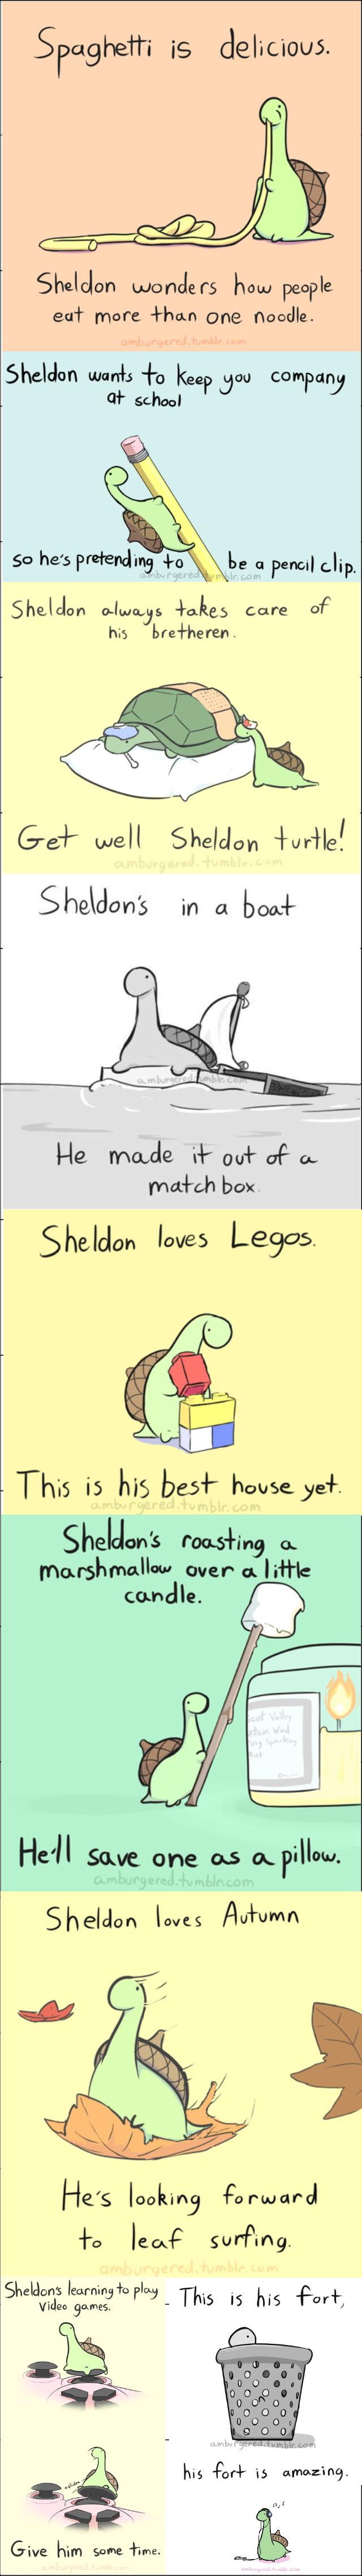 Sheldon the tiny dinosaur 2. /funny_pictures/4604525/Sheldon+the+t... All credit to Amburgered amburgered.tumblr.com/. Sheldon Turtle adorablness spoons hi